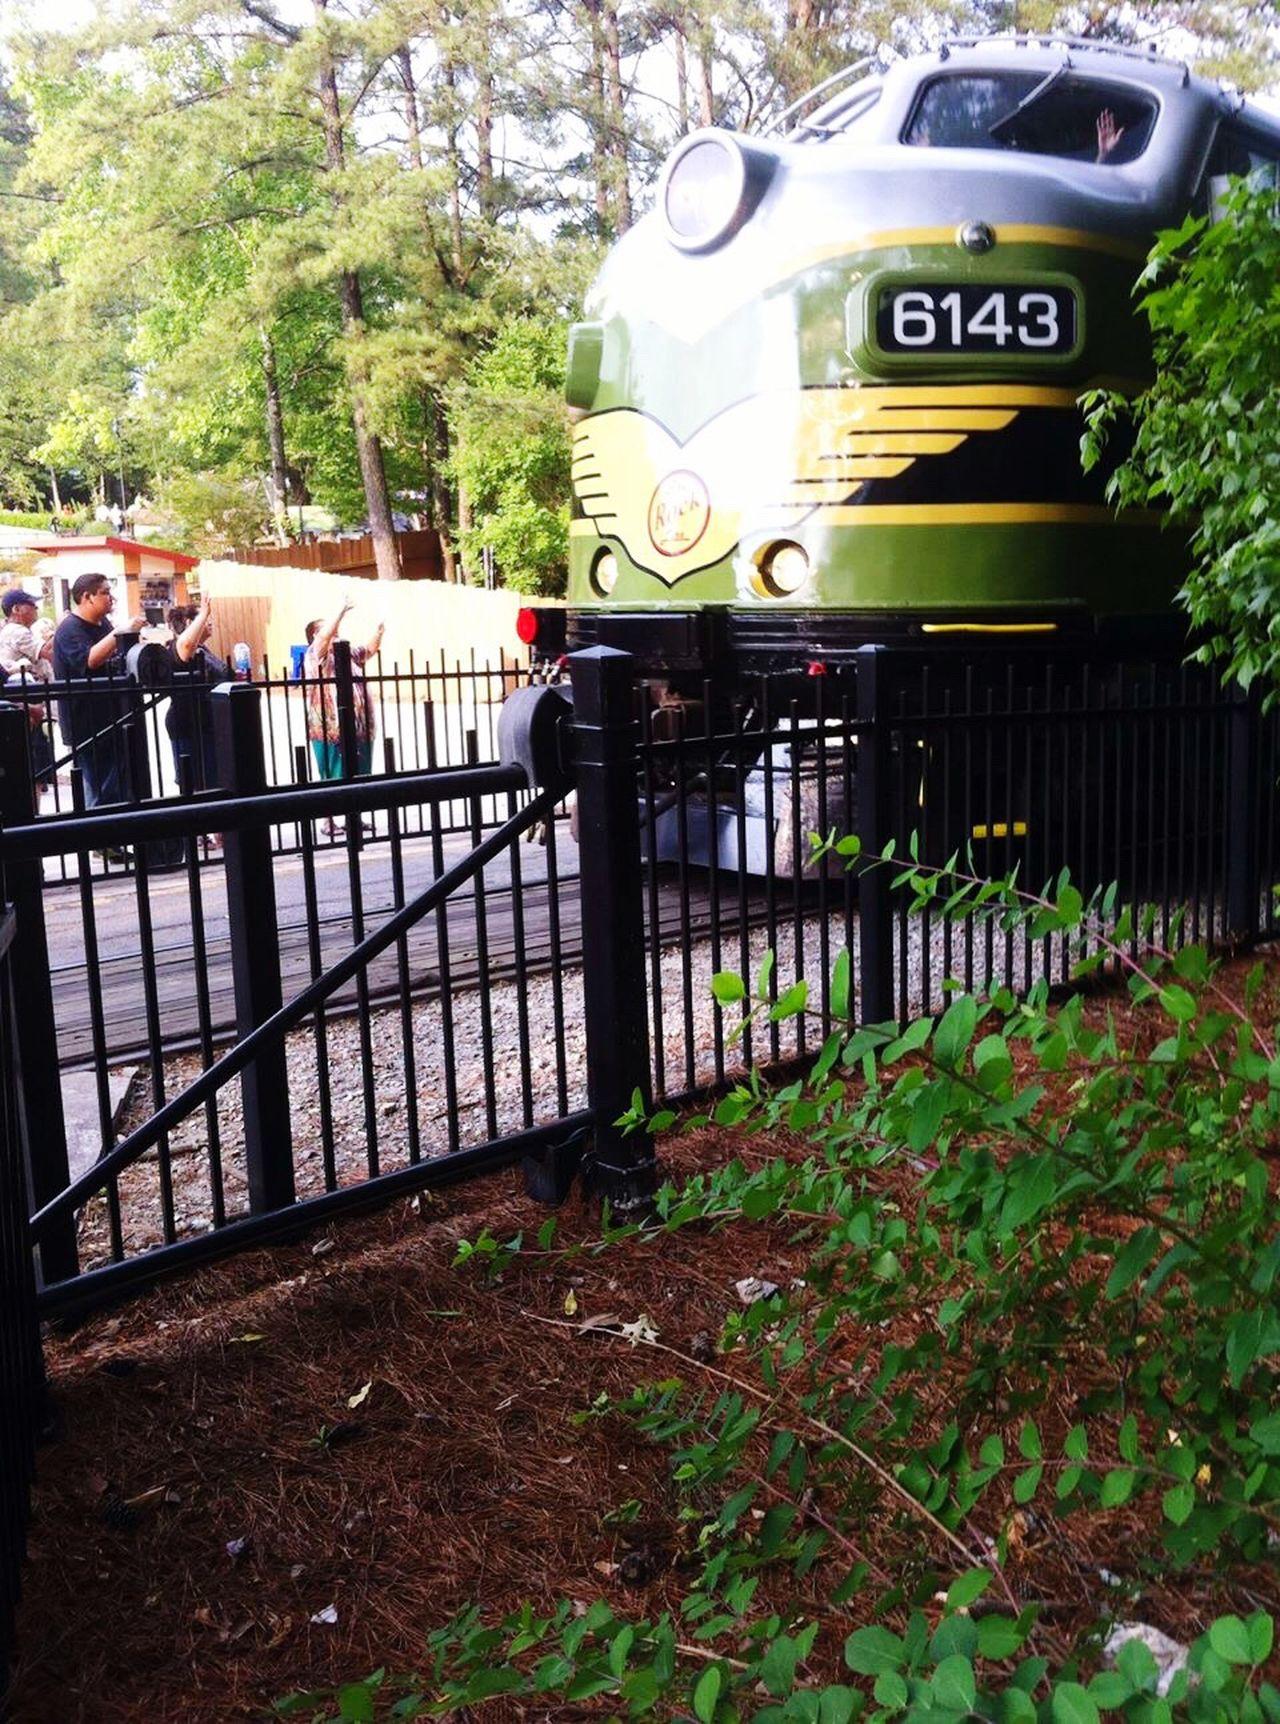 Train Stone Mountain GA Eye For Photography EyeEmBestPics EyeEm Best Shots Sightseeing Jay Margel Taking Photos Check This Out Enjoying Life I Phone Photography